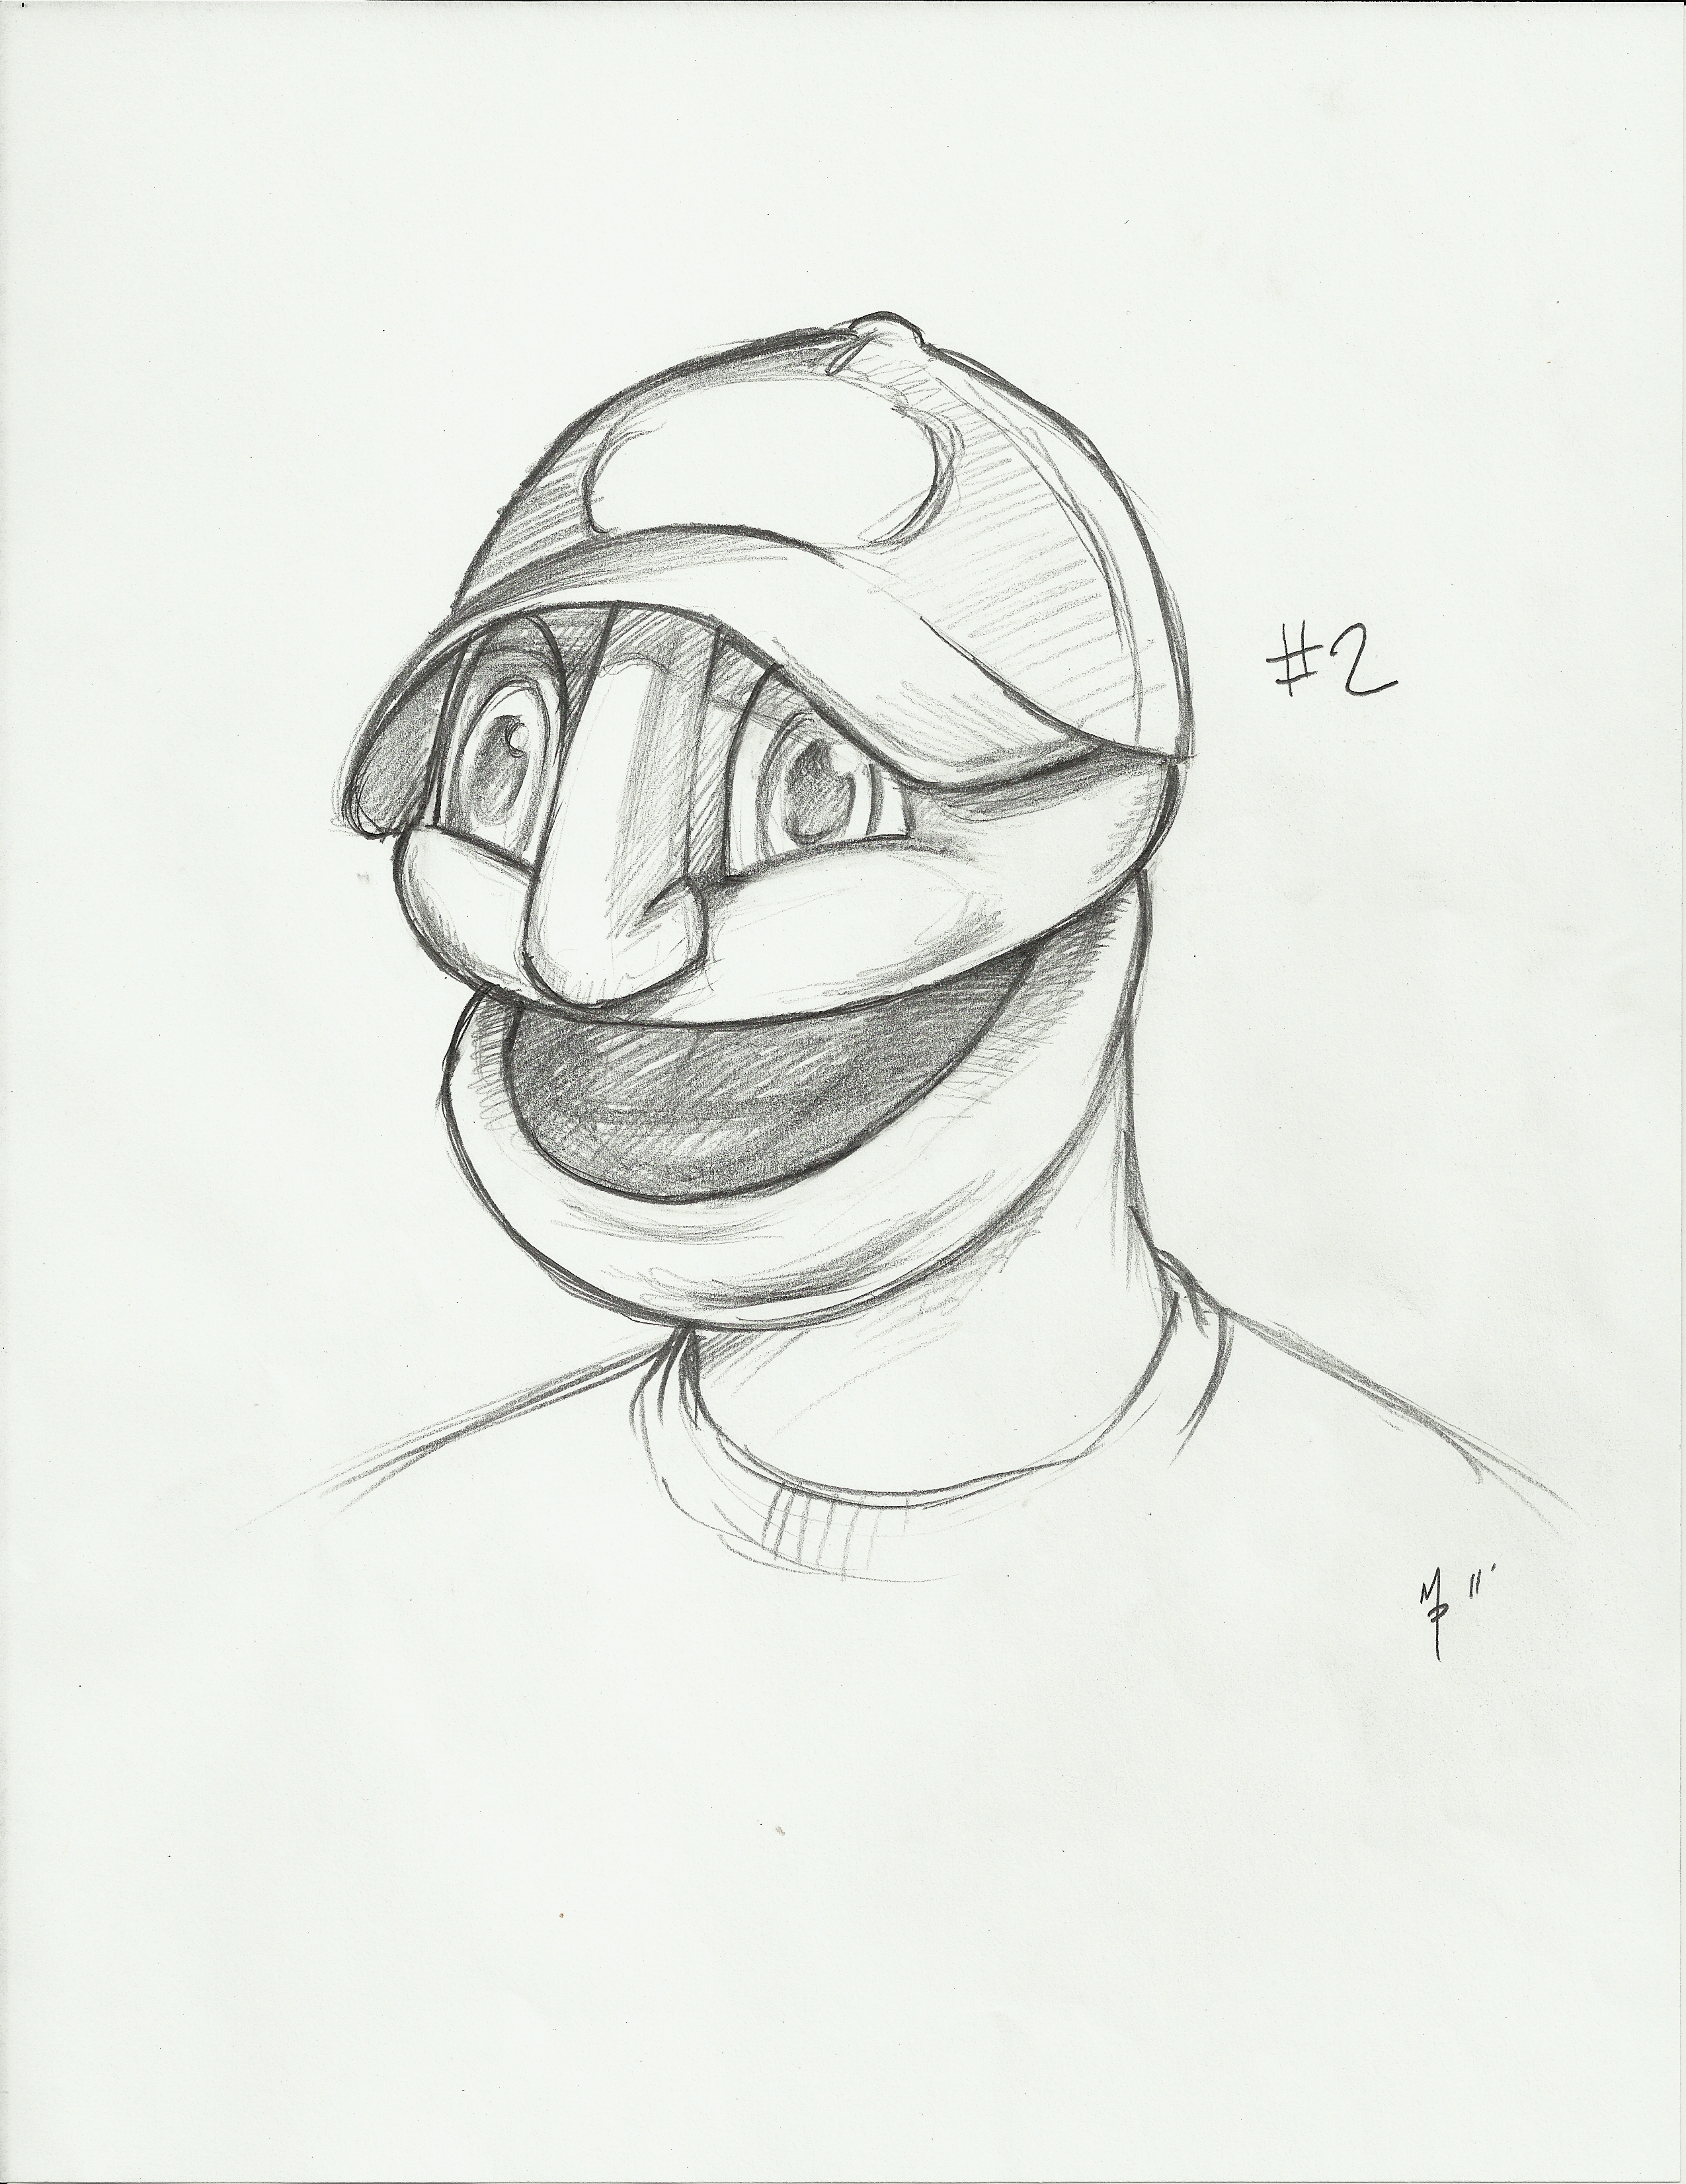 BobPuppet2